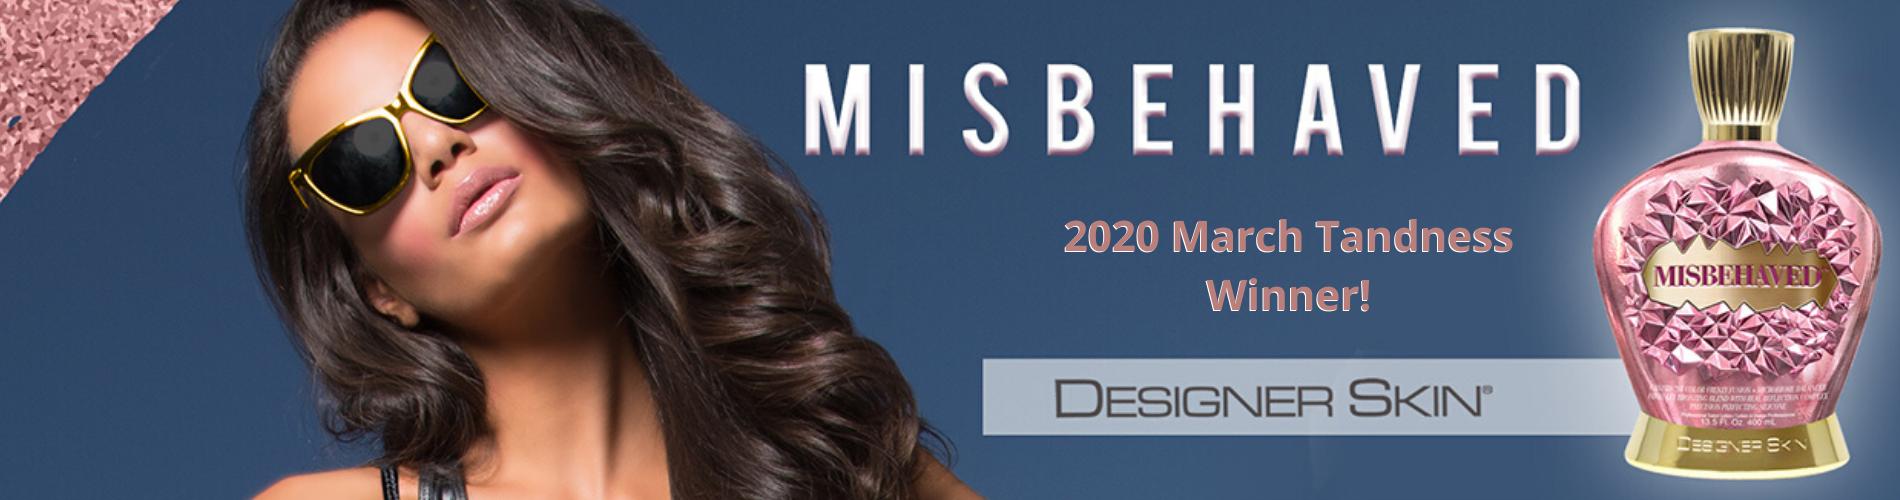 2020 March Tandness Winner